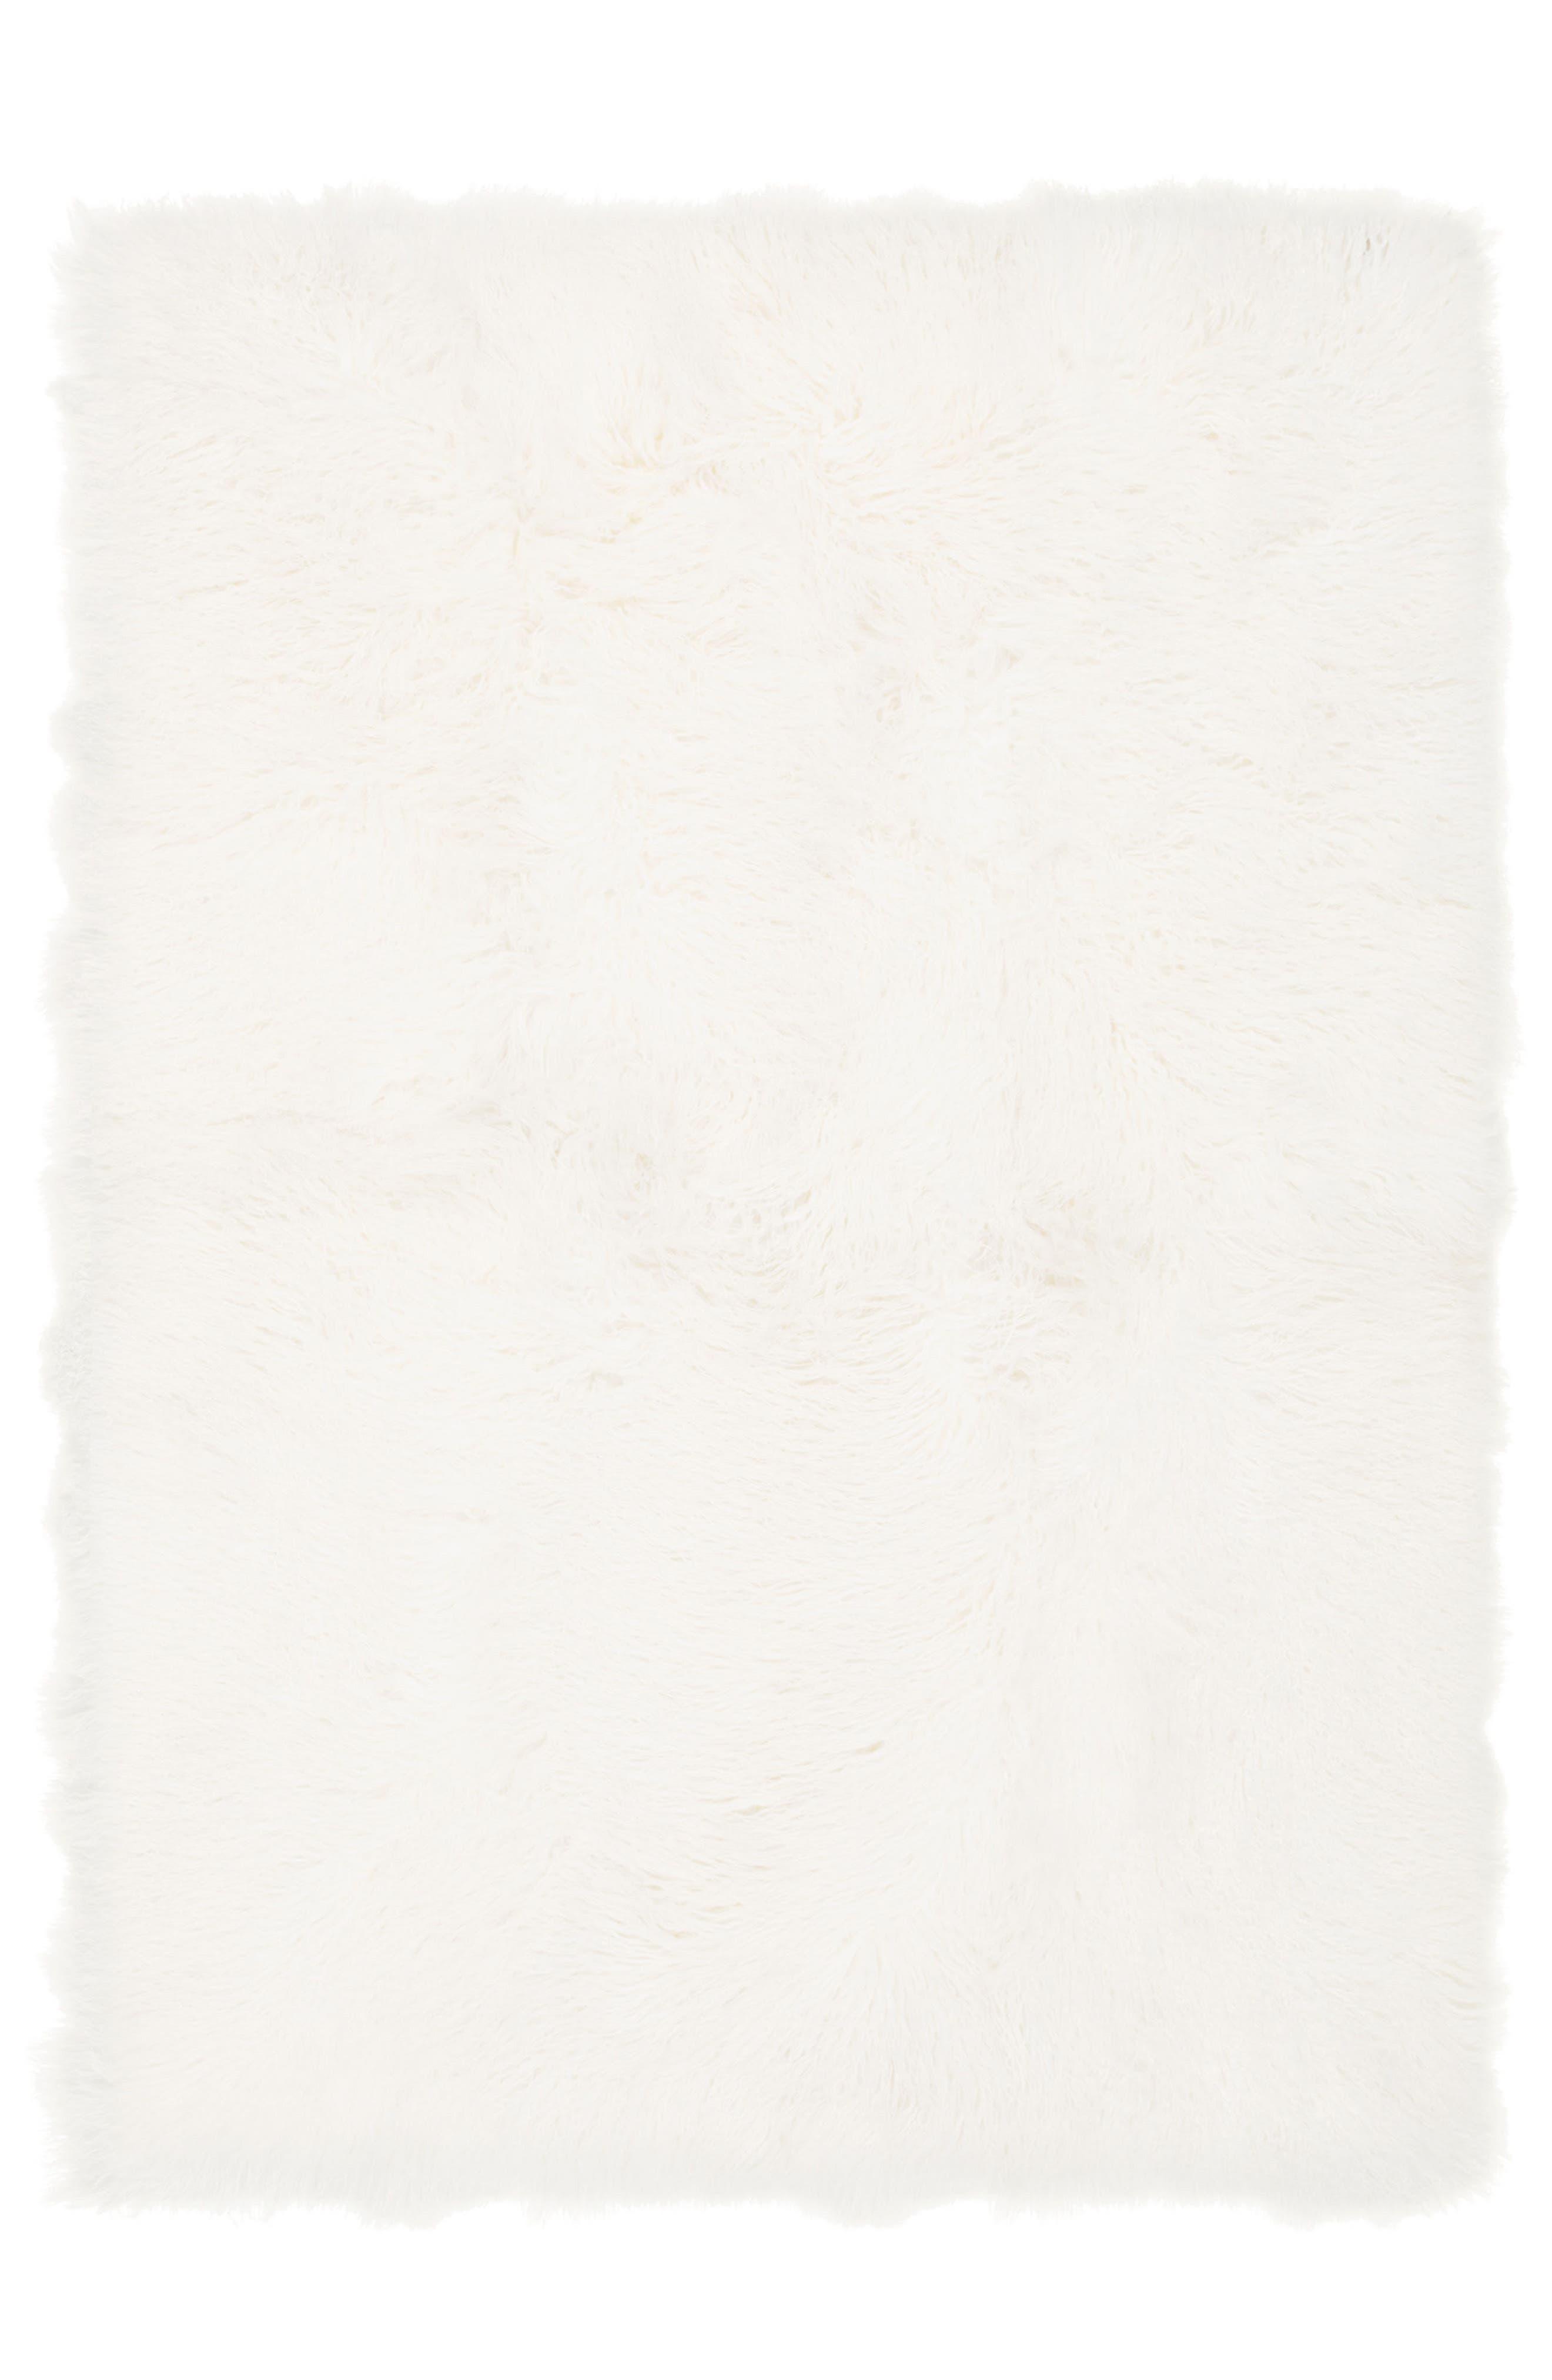 Moritz Matterhorn Genuine Shearling Area Rug,                             Main thumbnail 1, color,                             Ivory